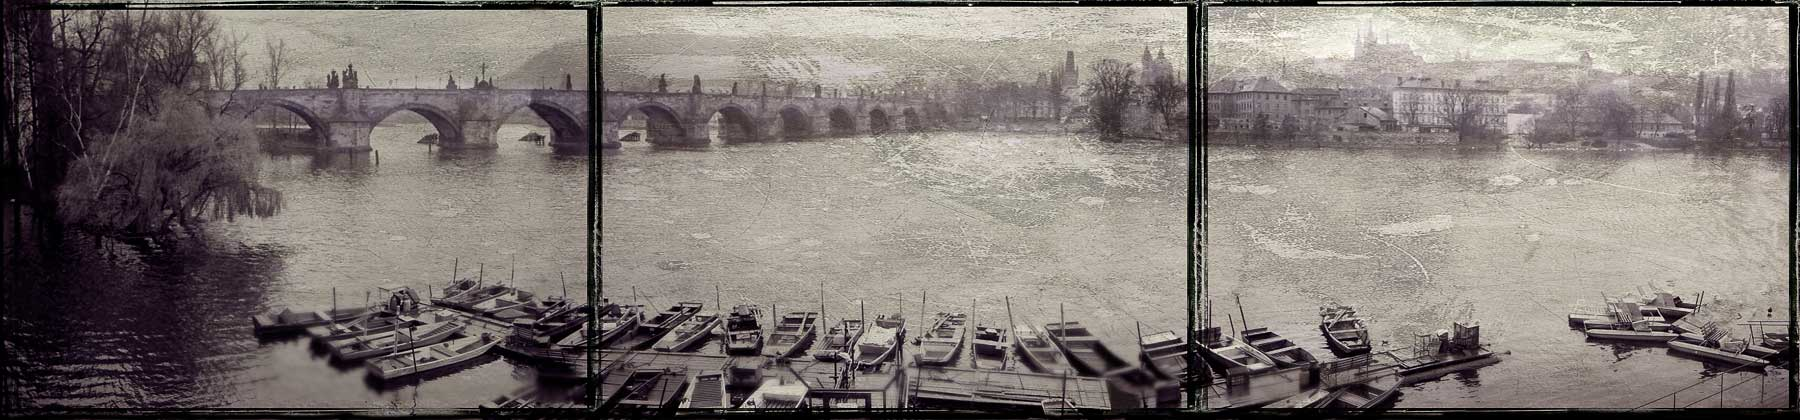 Charles_bridge_panoramic_2.jpg